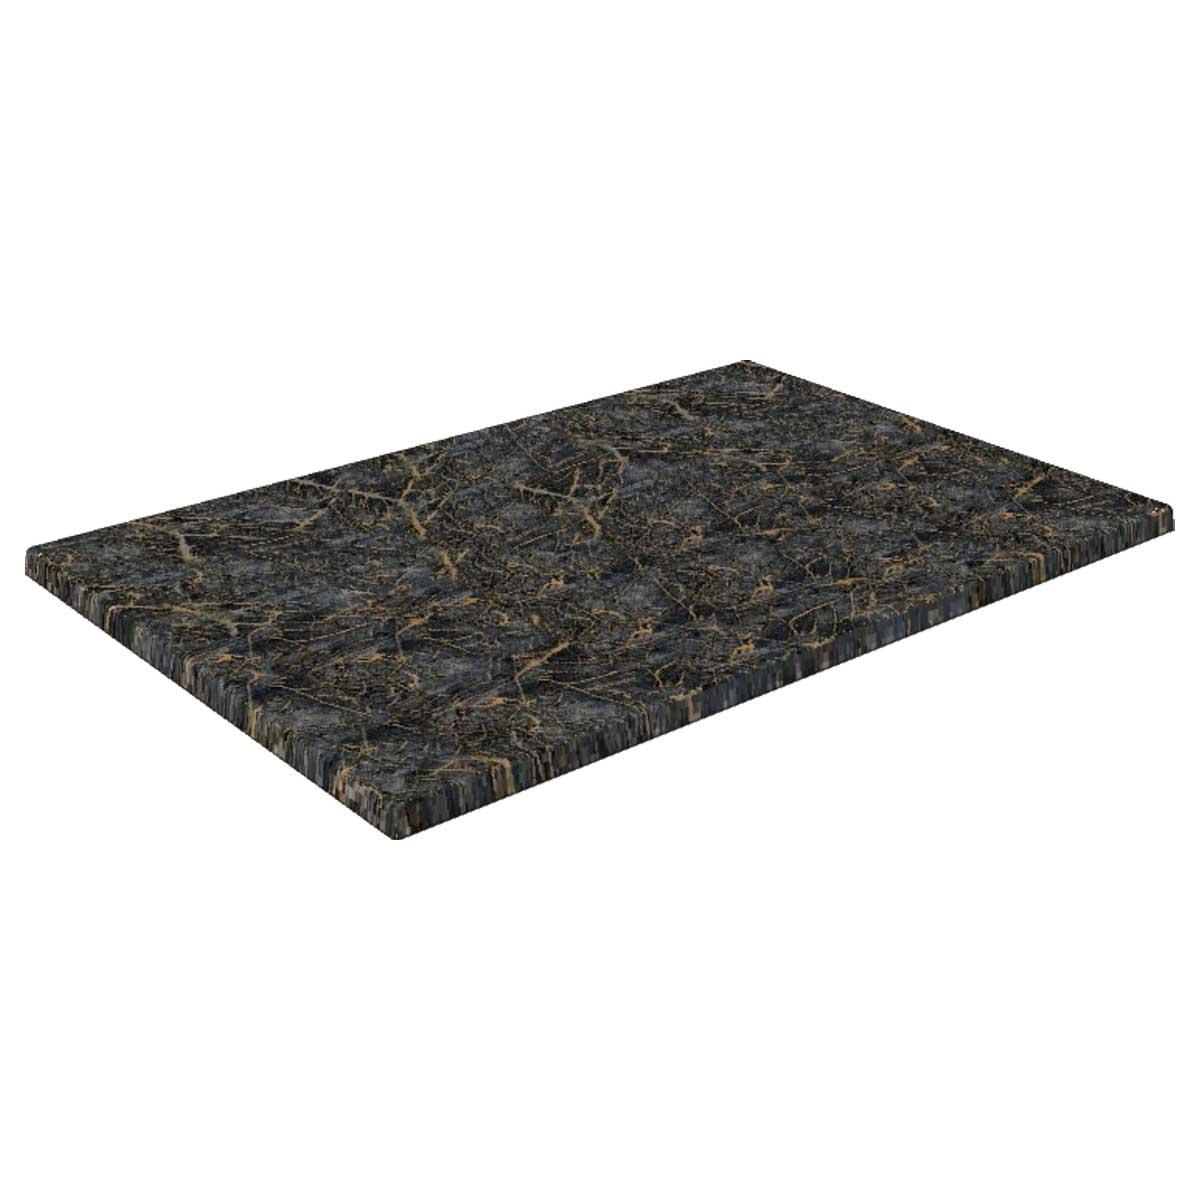 TICLA E120X80 174 - https://www.werzalit.com/fr/produit/plateau-de-table-classic-werzalit-e-120x80-174-marmor-sienna/